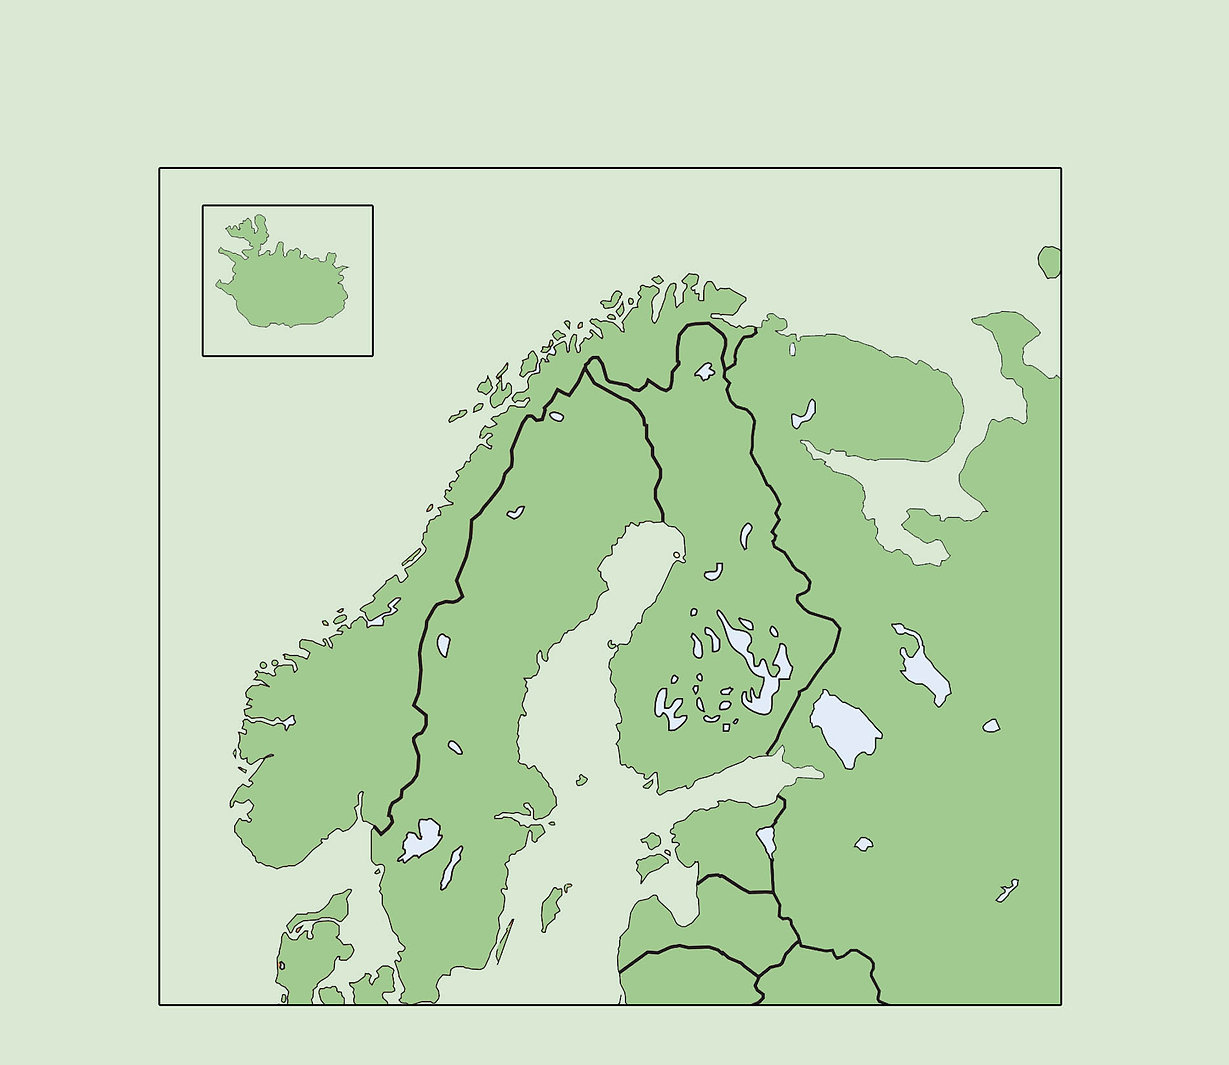 mapsquare2.jpg